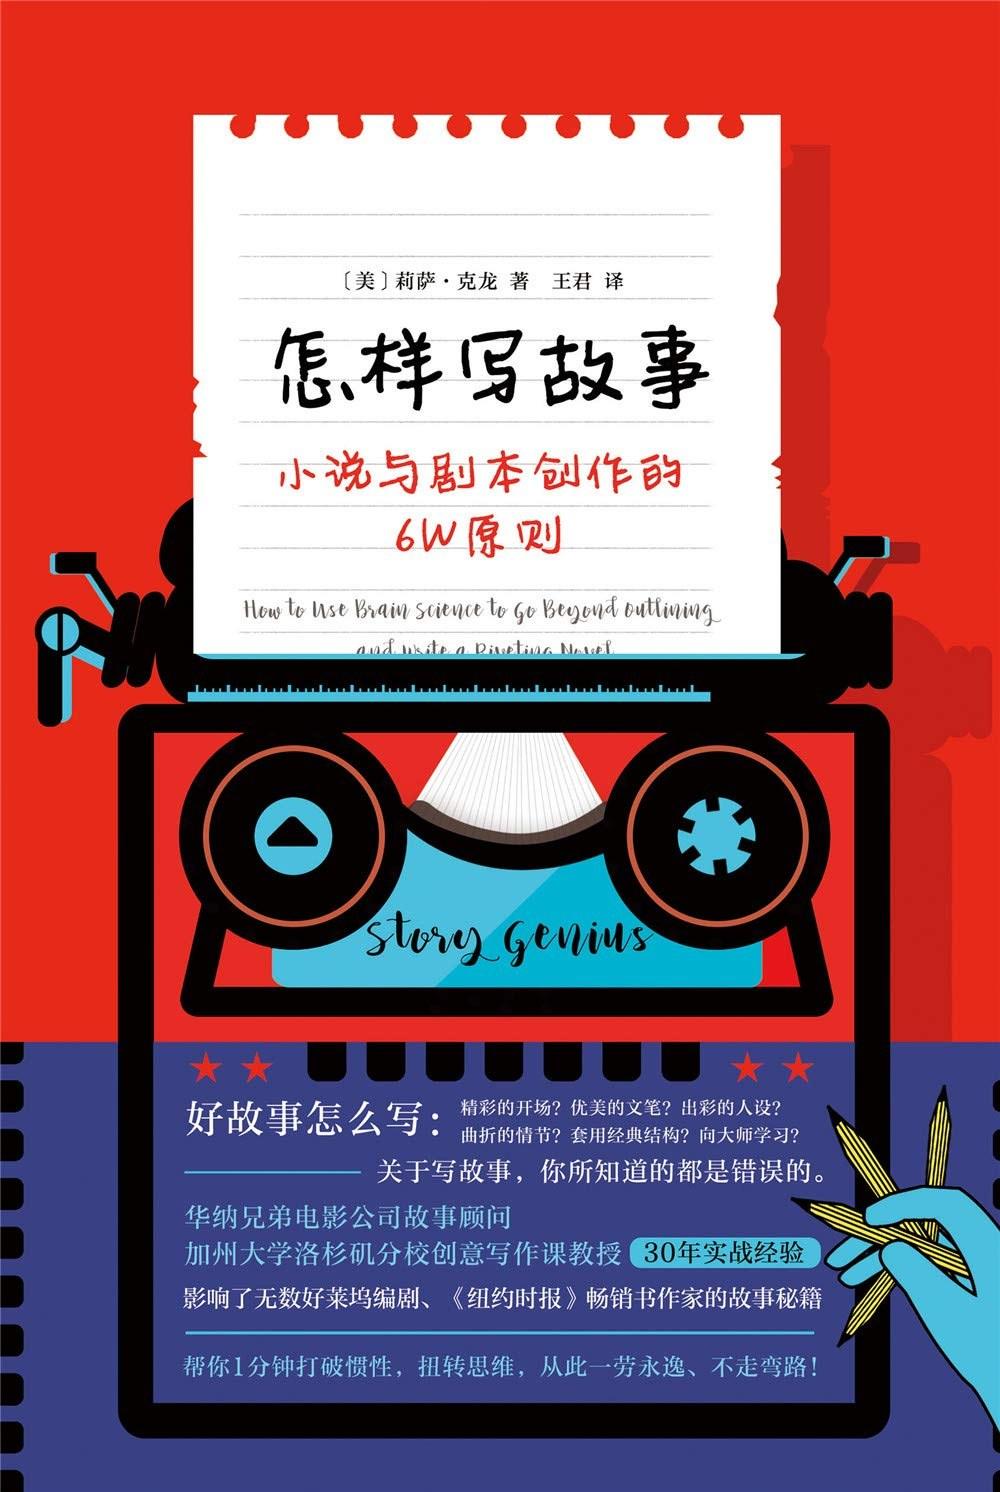 怎样写故事 (Chinese language, 2019, 读者出版社)